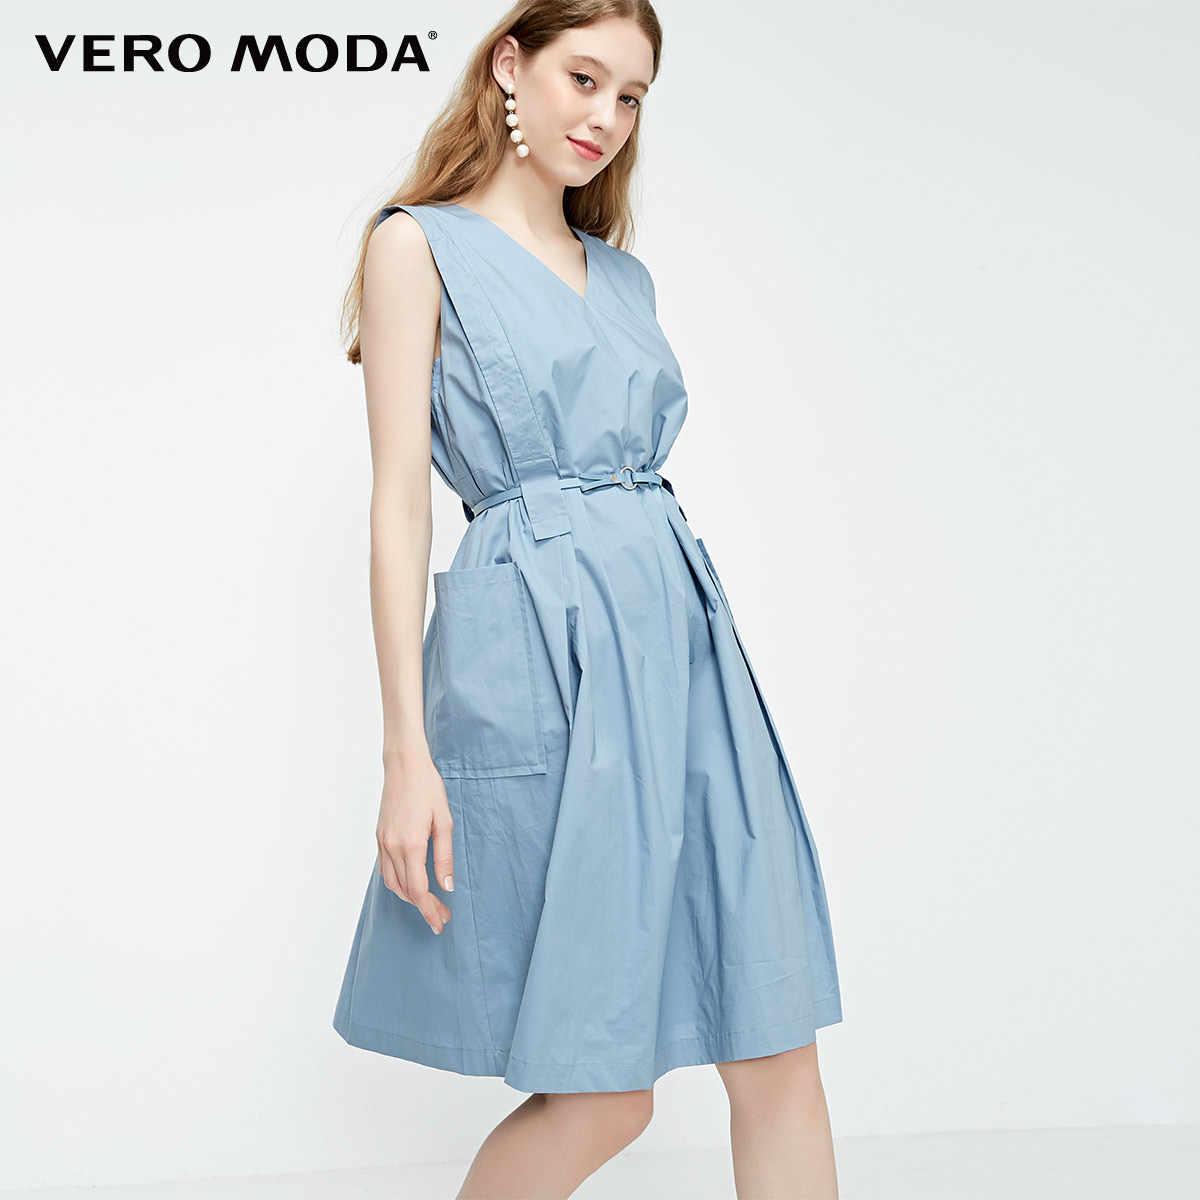 Vero Moda ใหม่ V คอ 100% ฝ้ายชุด   31927A502